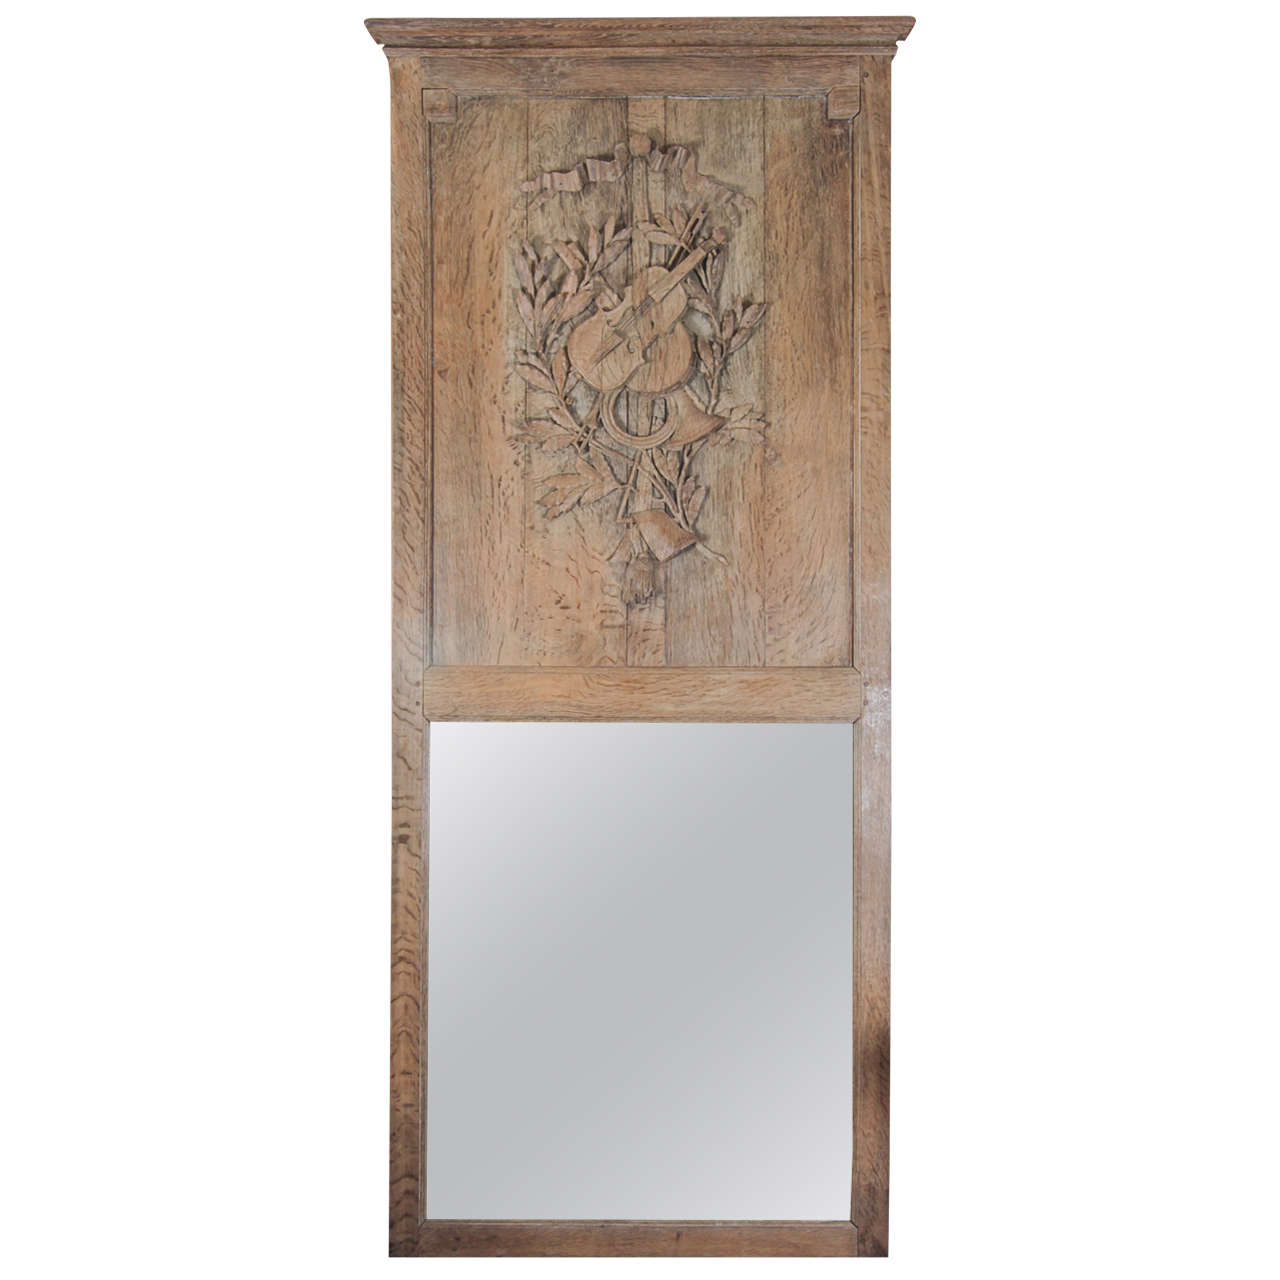 French 18th Century Trumeau Mirror